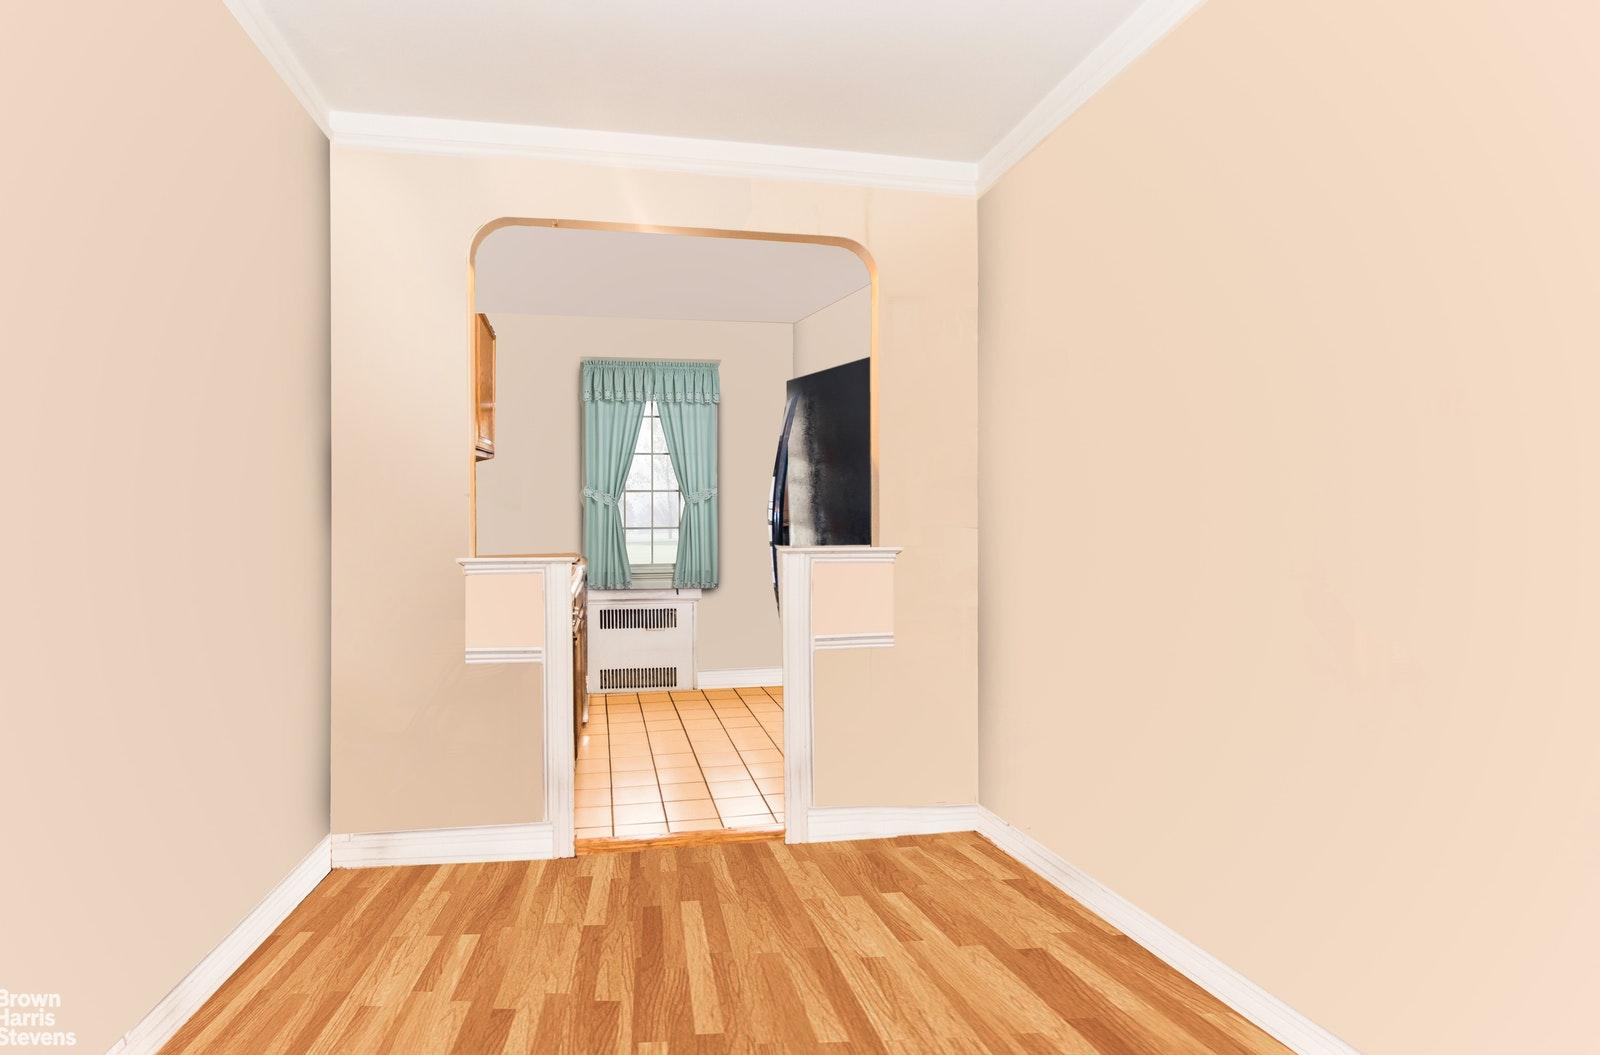 730 FT WASHINGTON AVENUE 1F, Hudson Heights, $545,000, Web #: 20055495